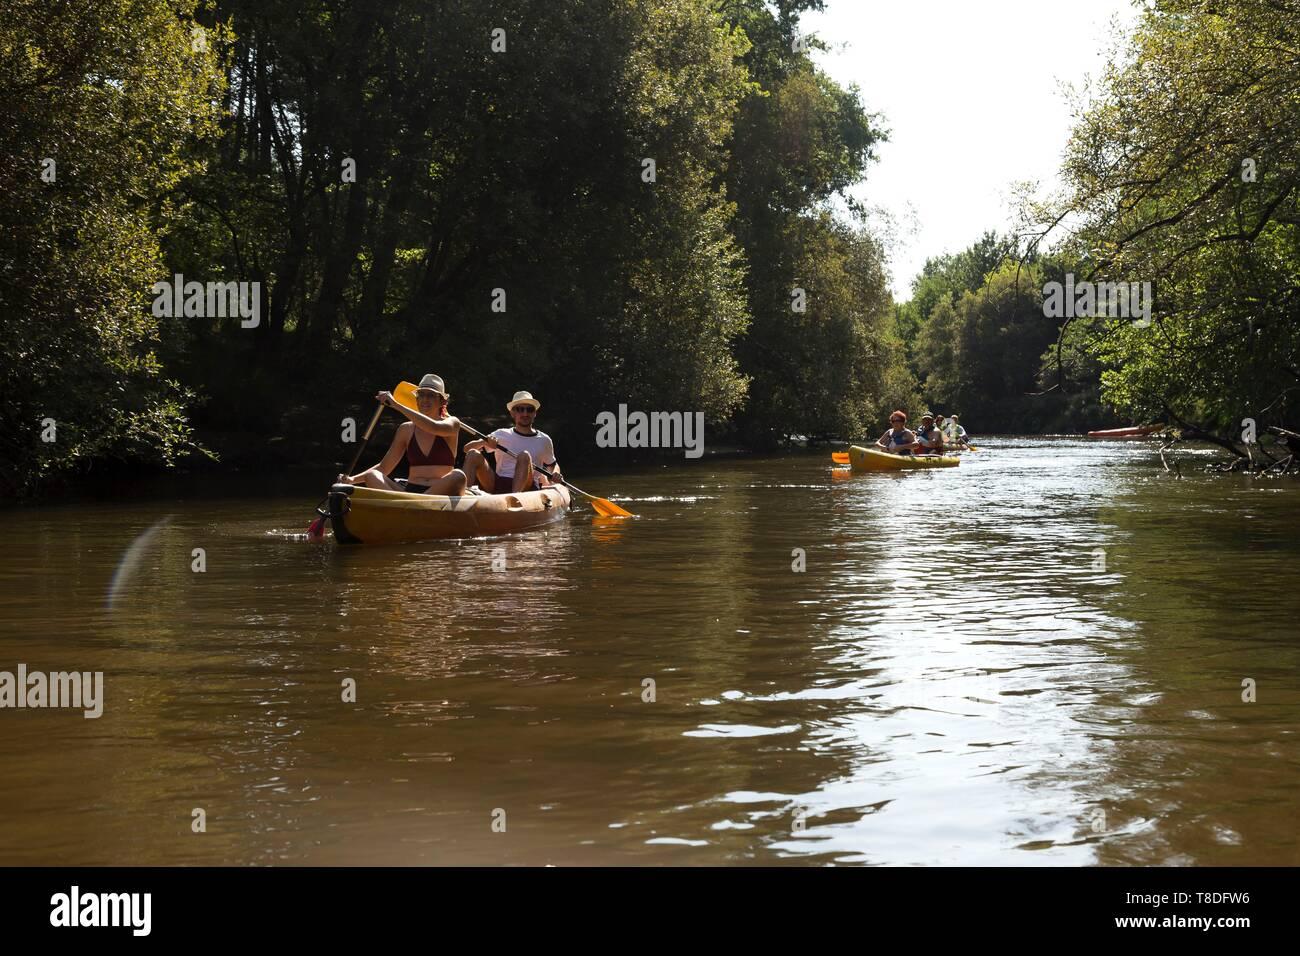 France, Gironde, Val de L'Eyre, Parc Naturel RÚgional des Landes de Gascogne, Salles, Leyre river, canoeing on the river - Stock Image